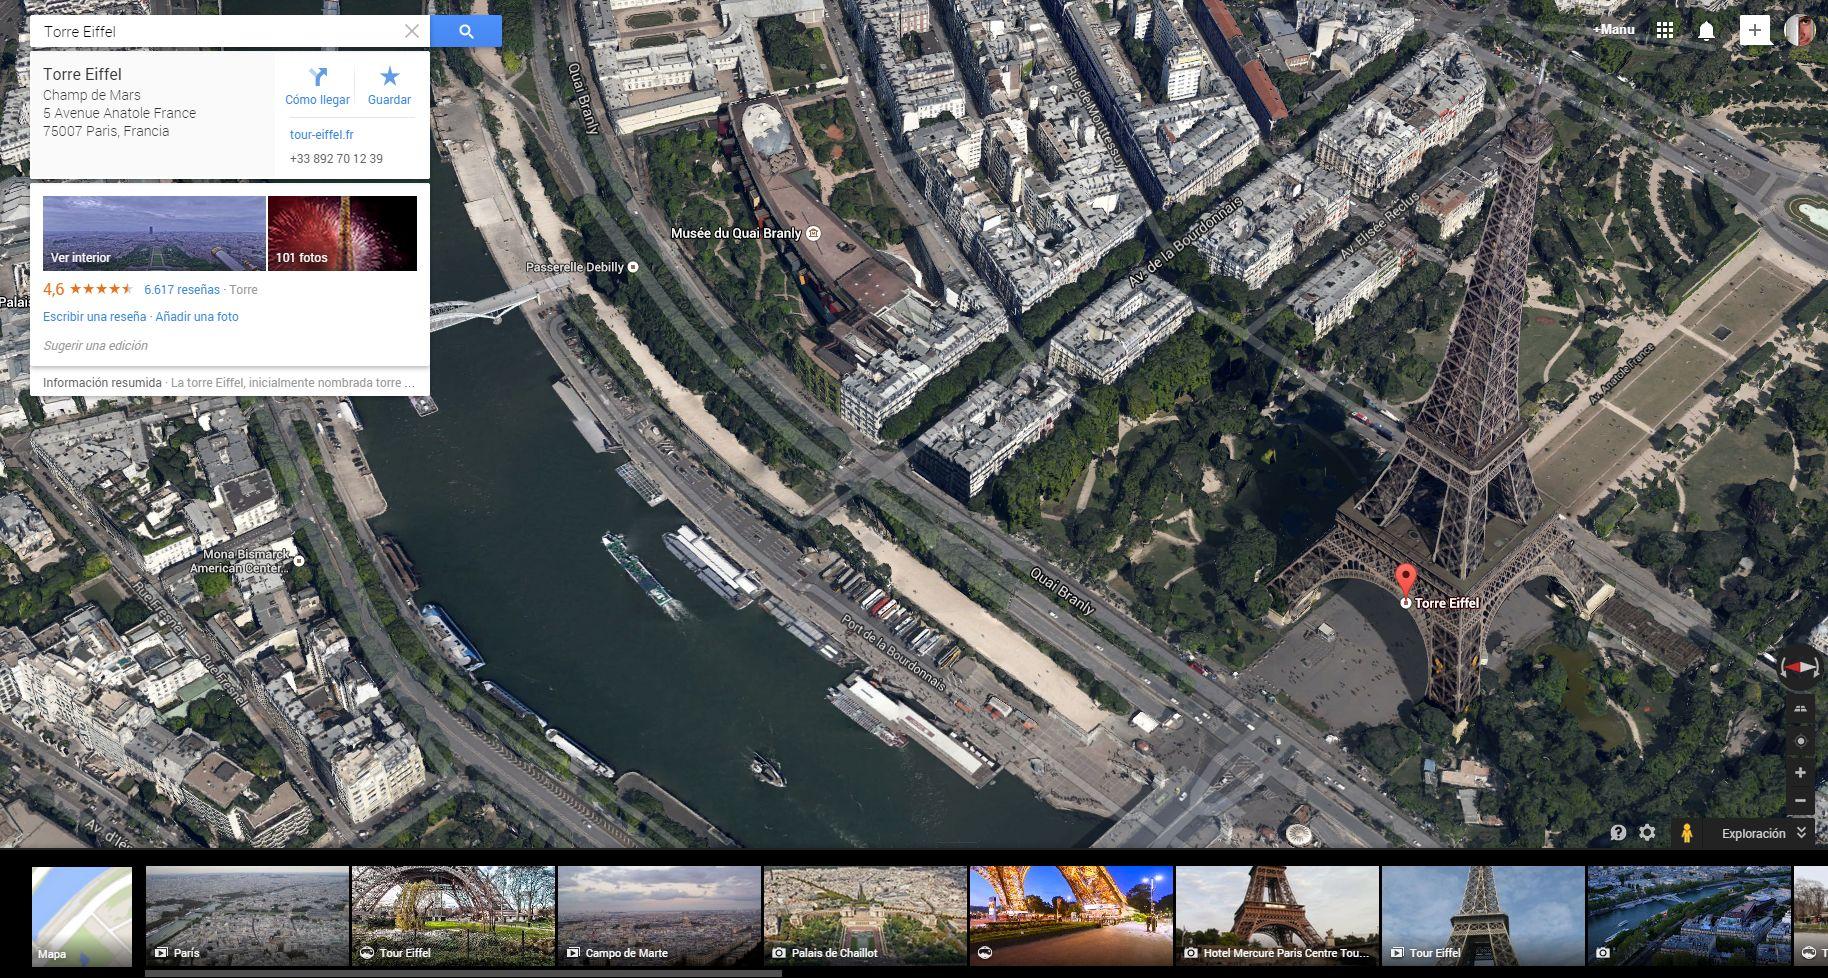 Torre Eiffel   Google Maps